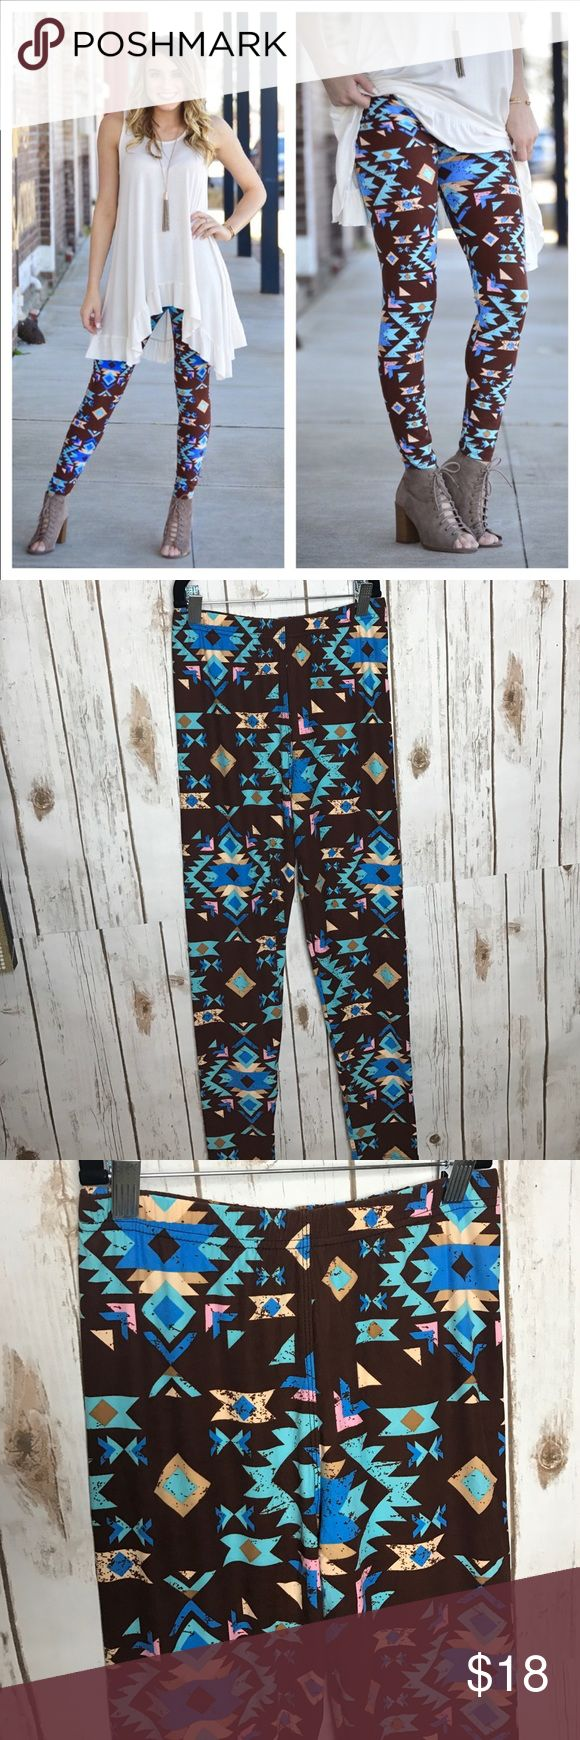 Aztec Print Leggings Soft knit leggings. Soft brushed knit leggings. 92% polyester 8% spandex. Elastic band ( no yoga band) One size fits up to size 12 comfortably. Gali's Fashion Pants Leggings